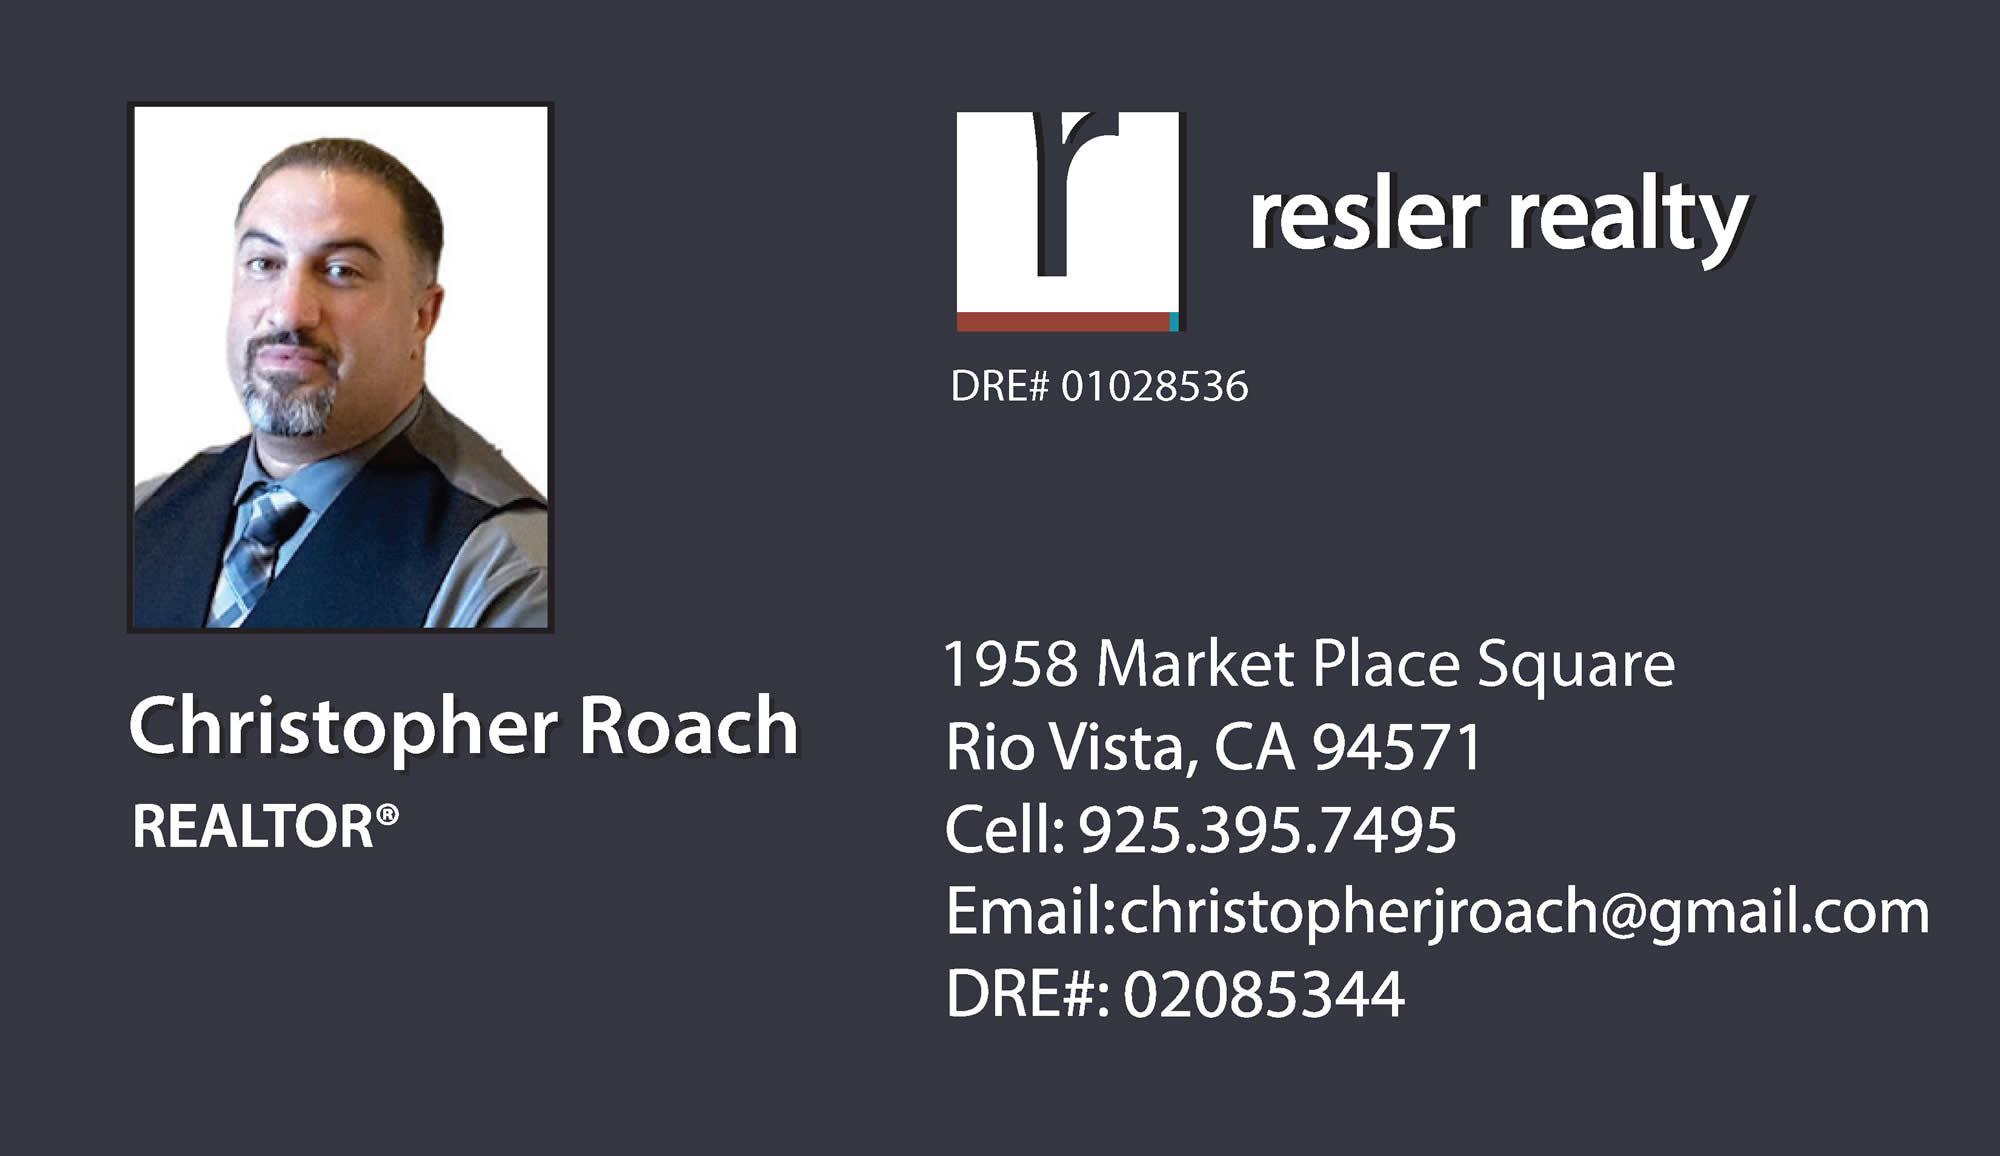 Christopher Roach